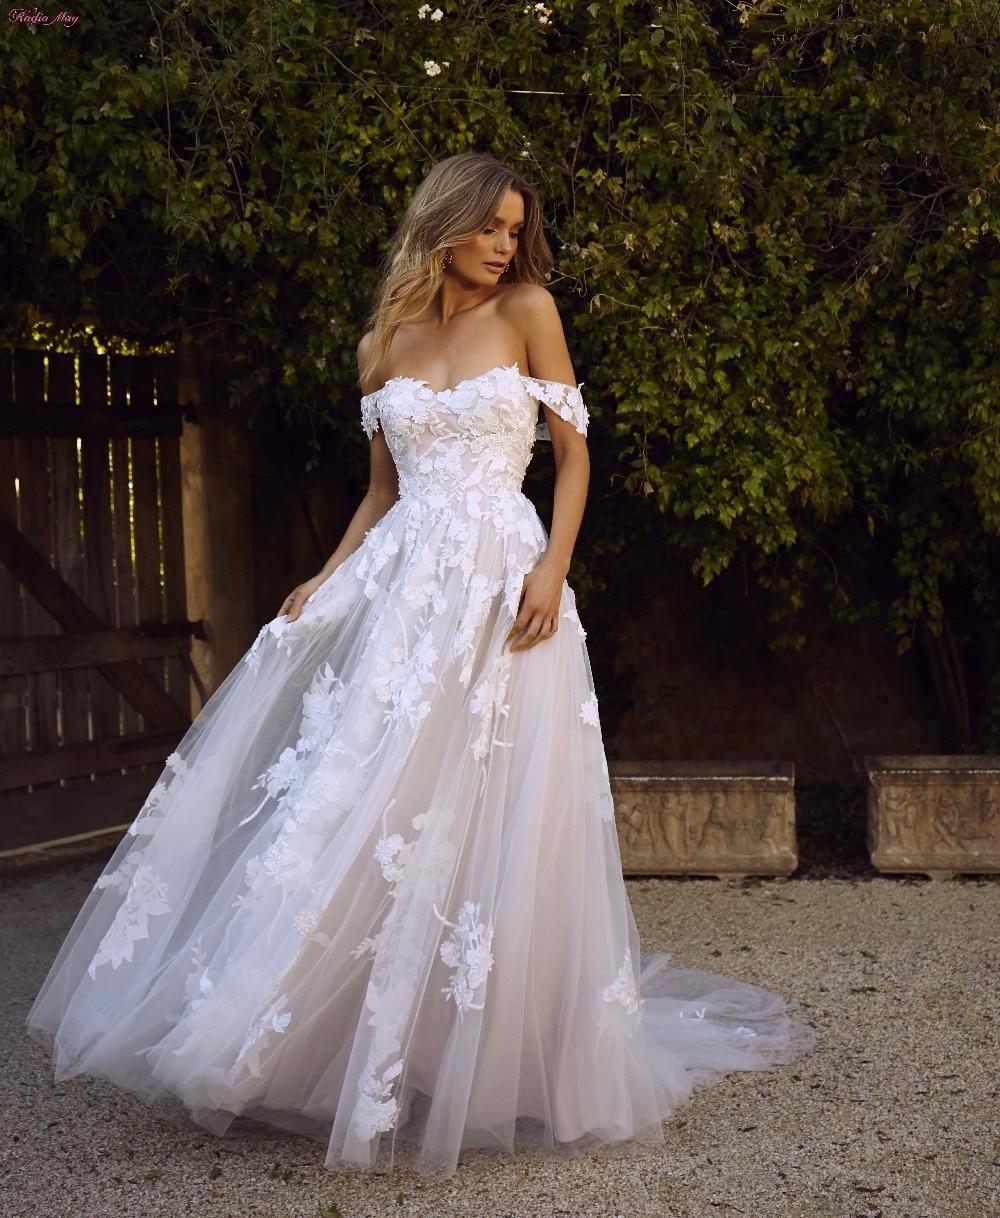 Rustic Boho Lace Beach Wedding Dress 2019 Vintage 3D